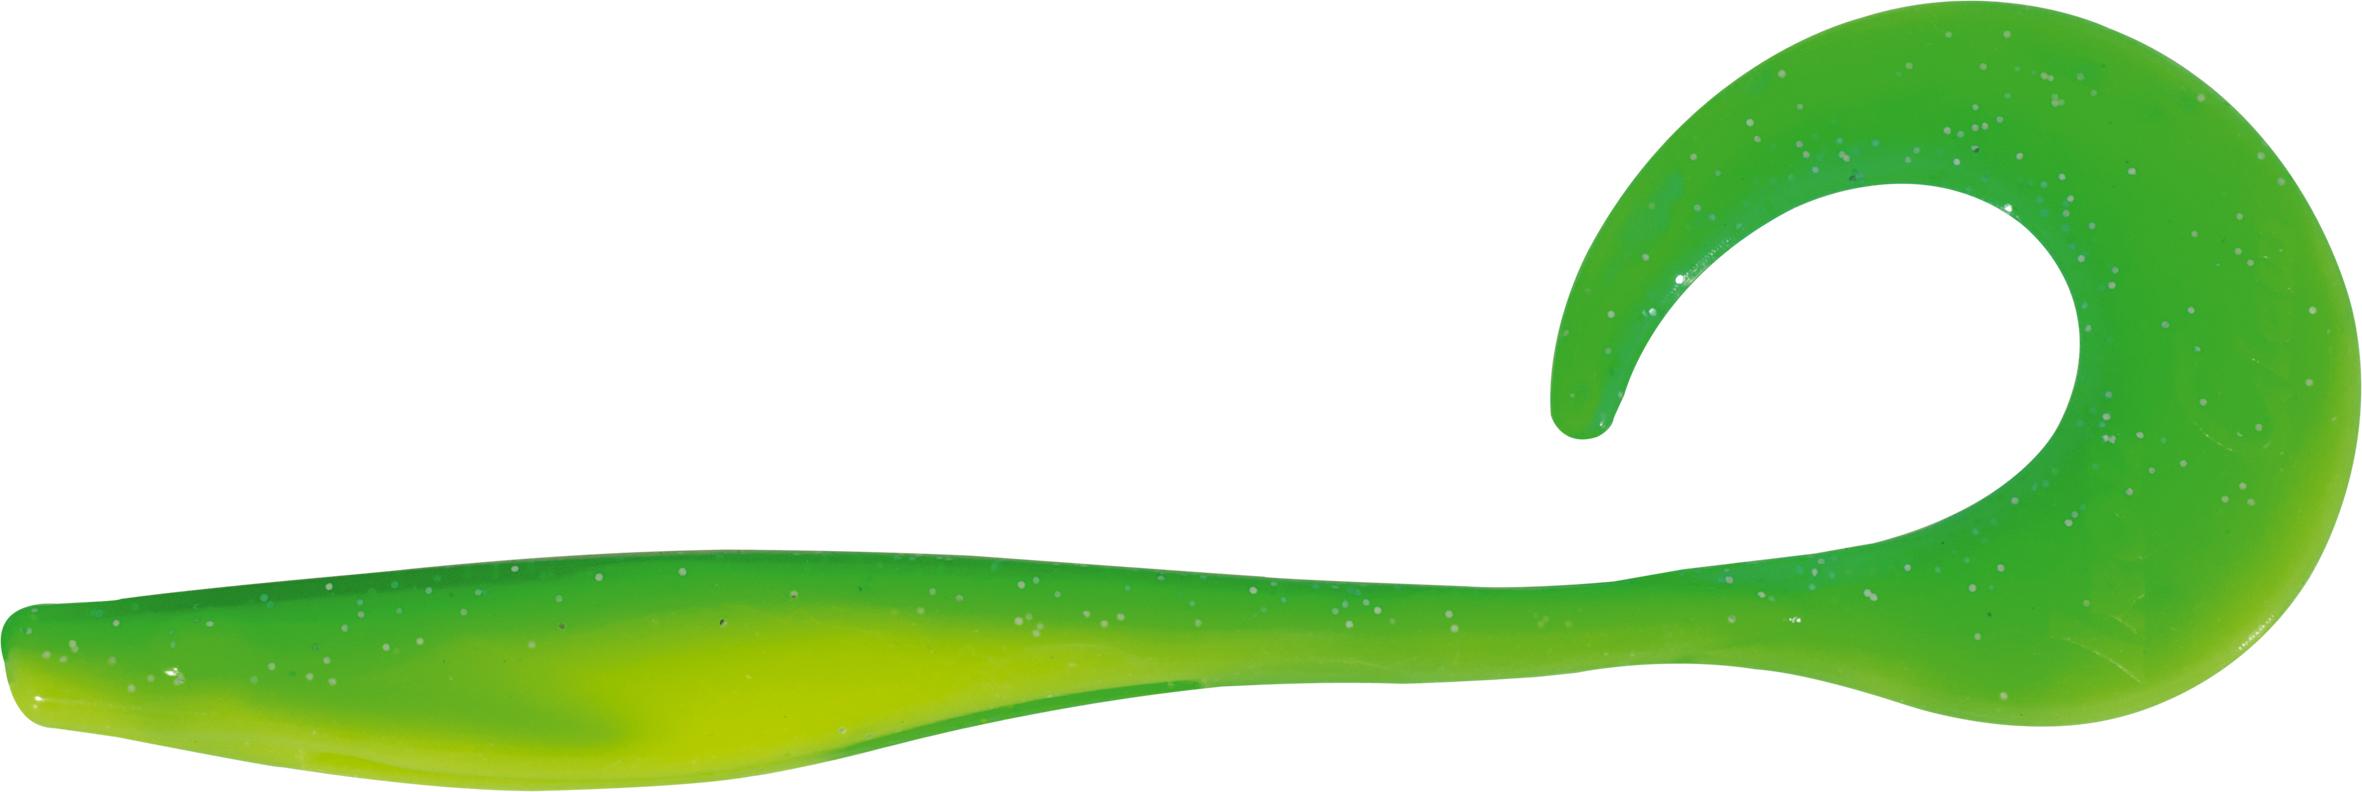 Iron Claw gumová nástraha Slim Jane 13,5 cm Vzor CG, 3 ks